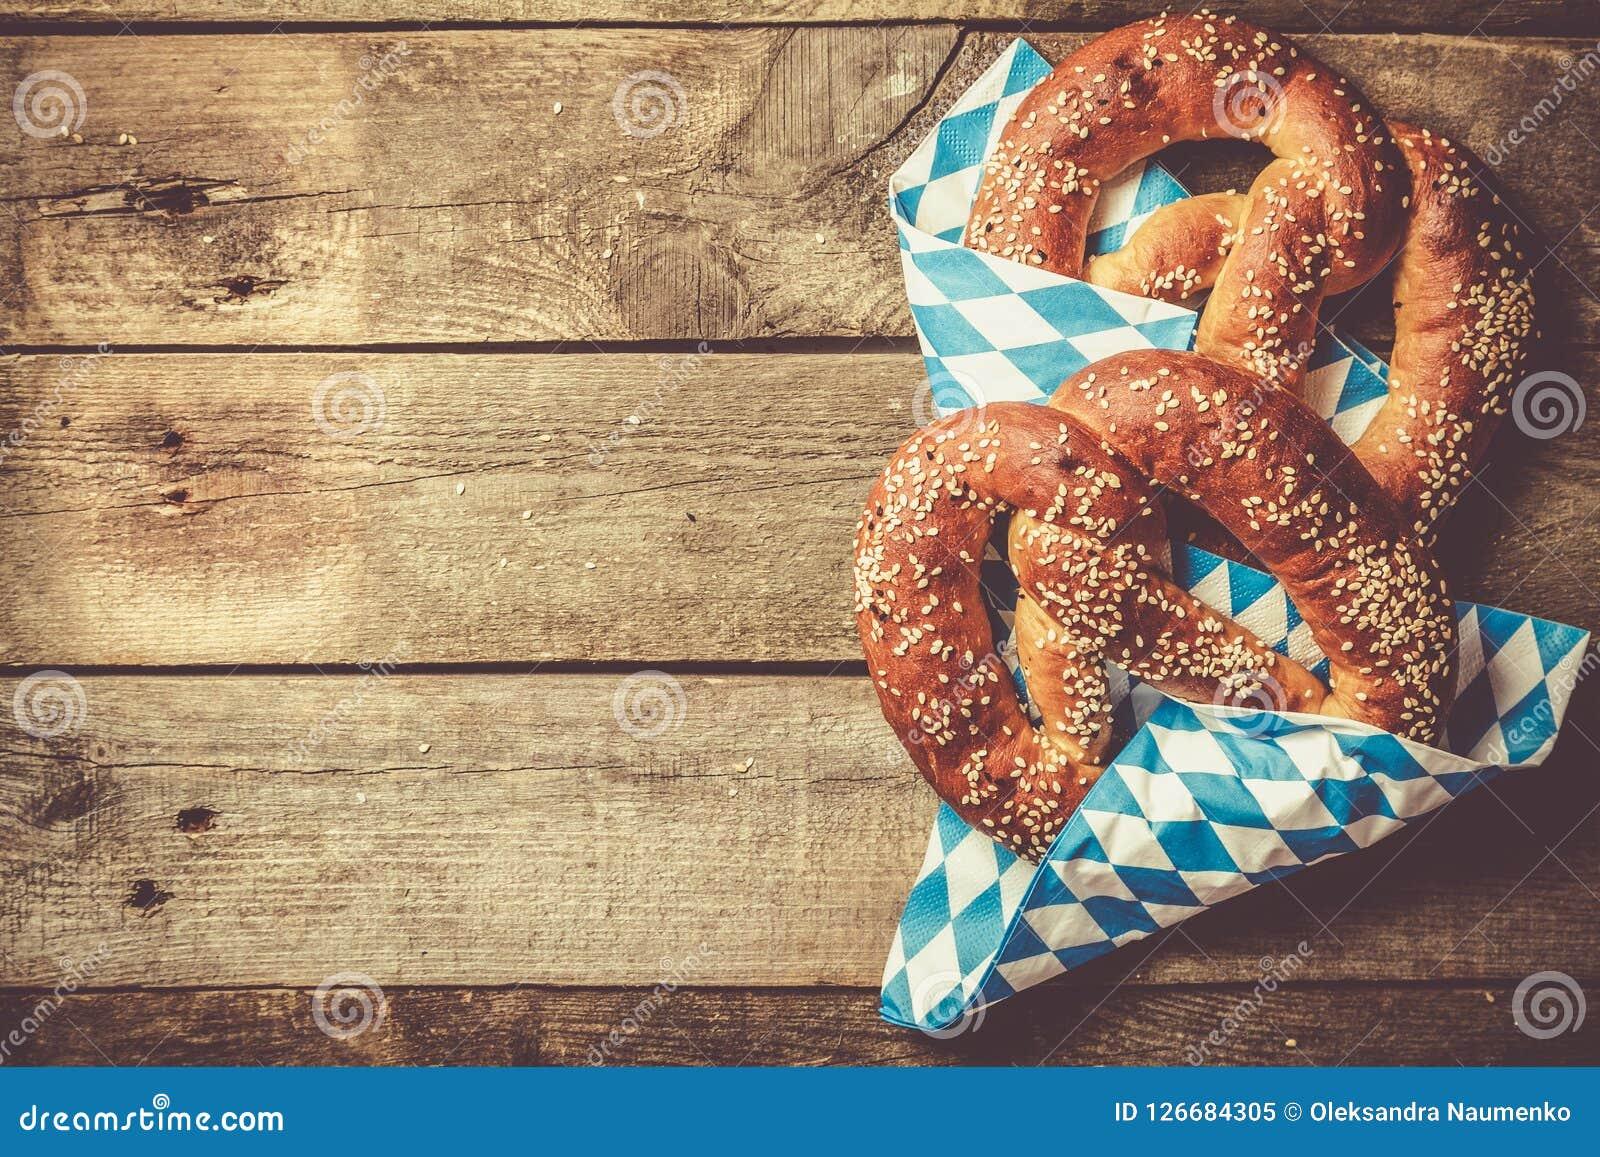 Oktoberfest concept - pretzels on rustic wood background